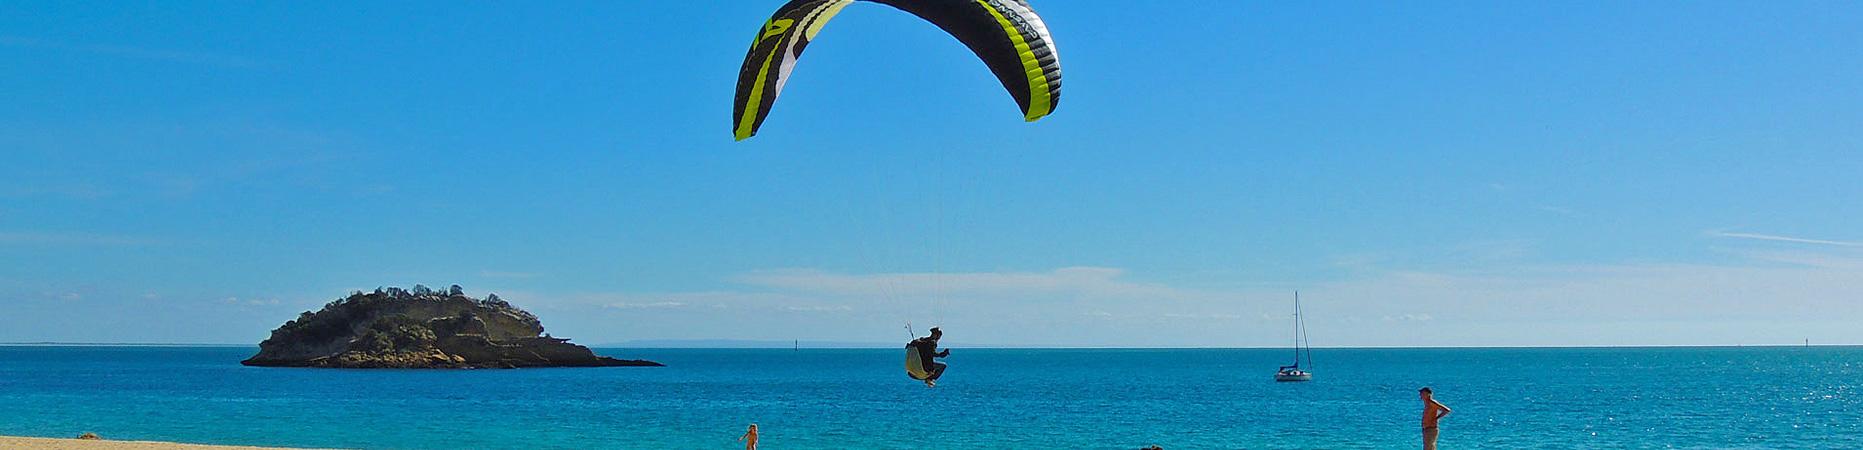 X-dream Fly Reisen La Palma